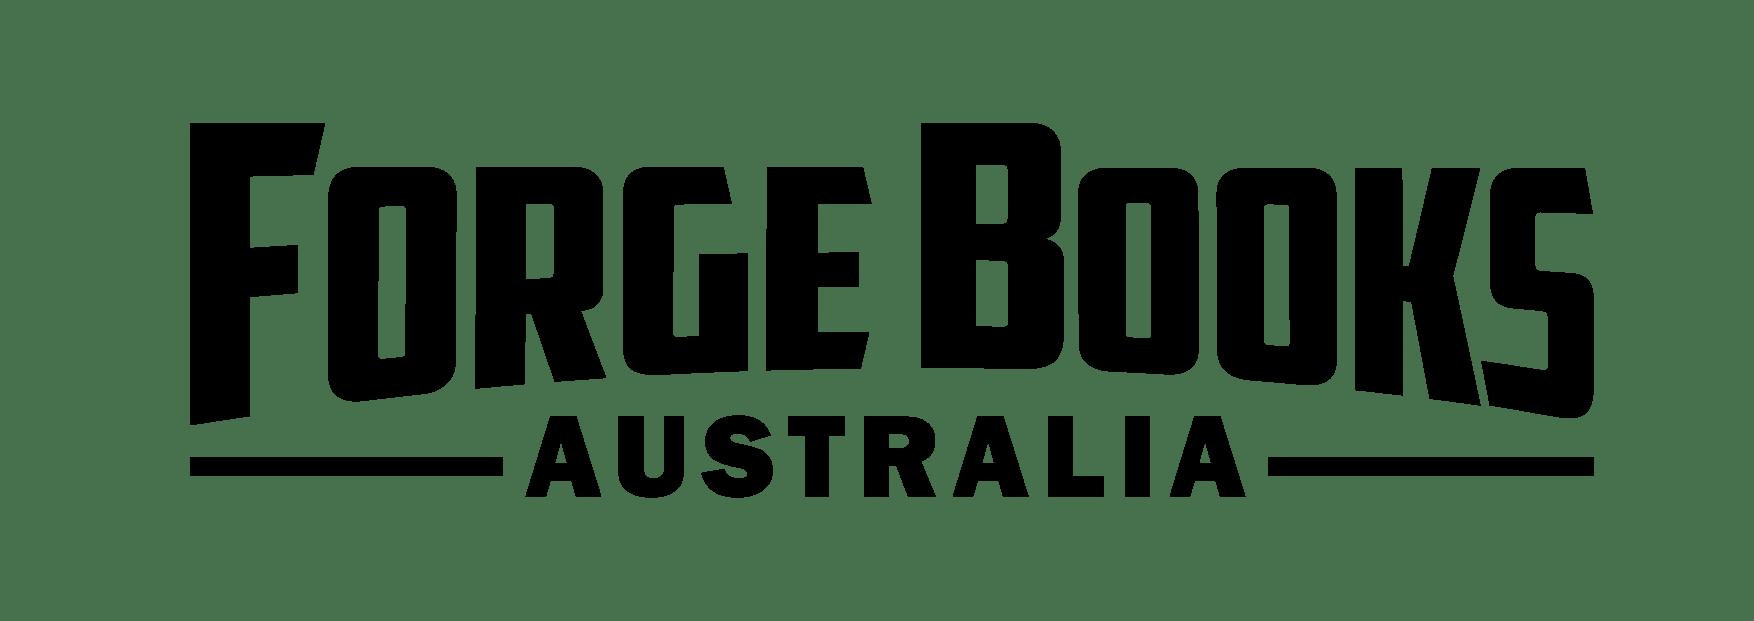 Forge Books